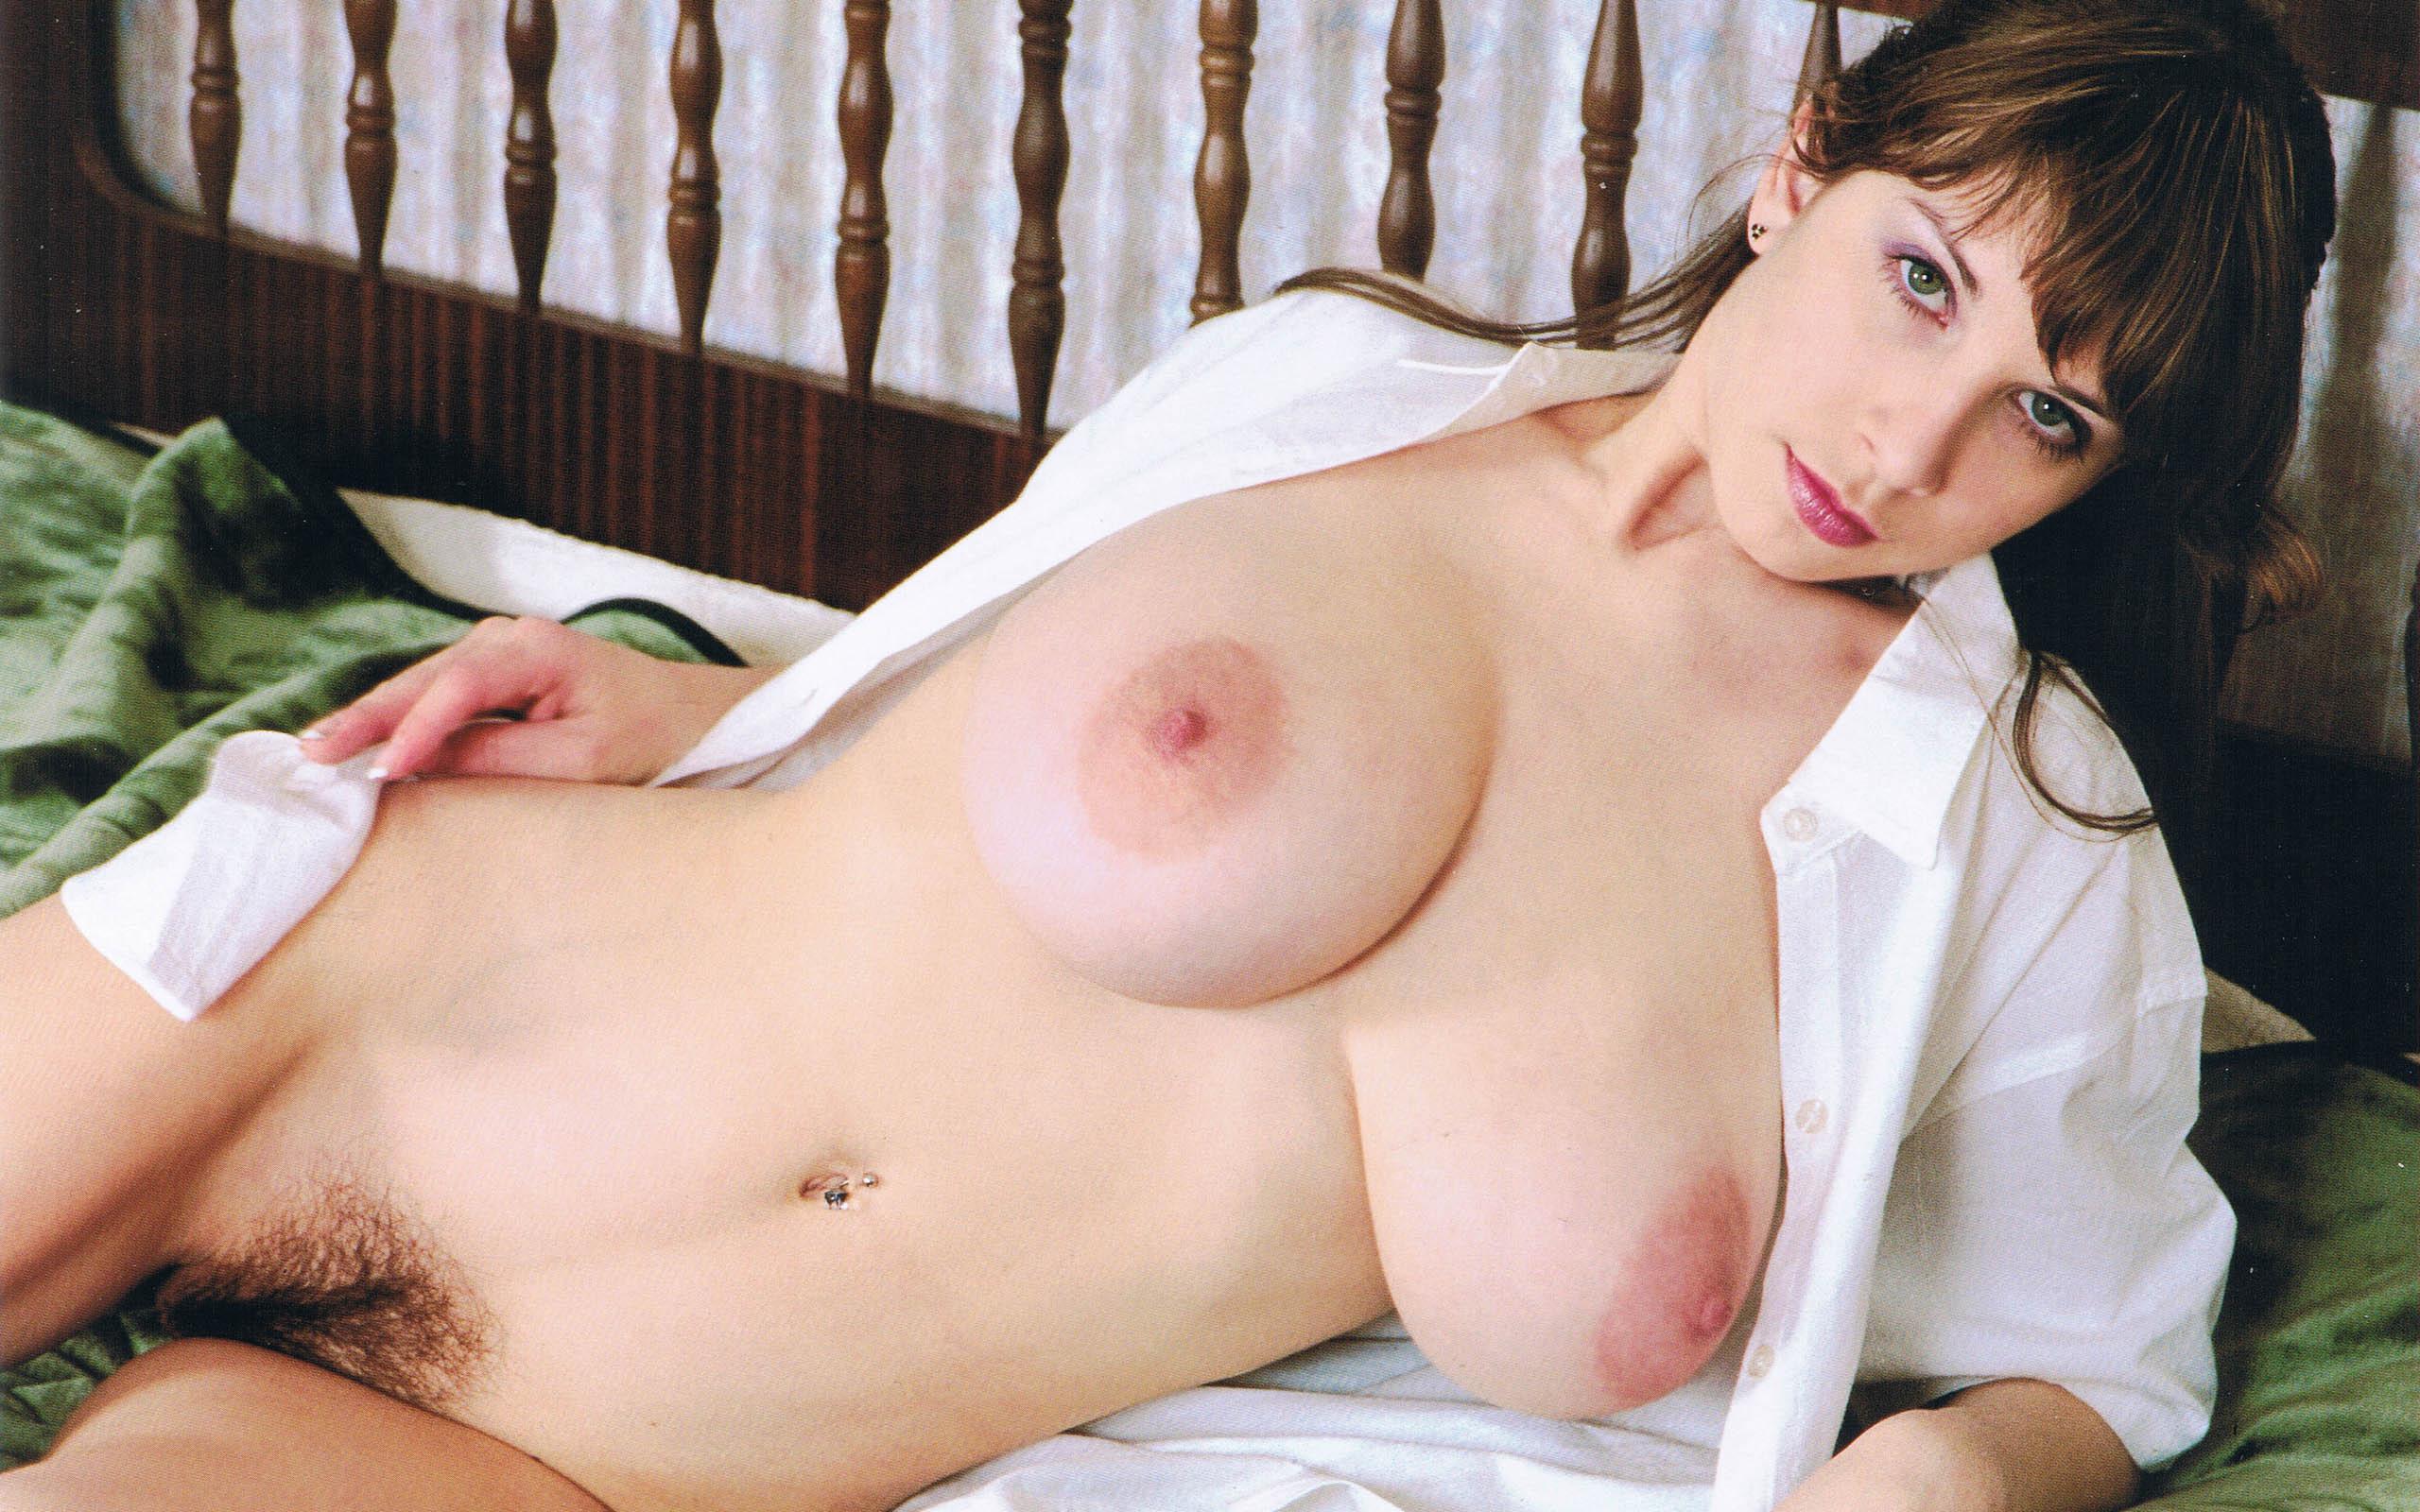 Yulia Nova Showing Pussy Igfap | CLOUDY GIRL PICS